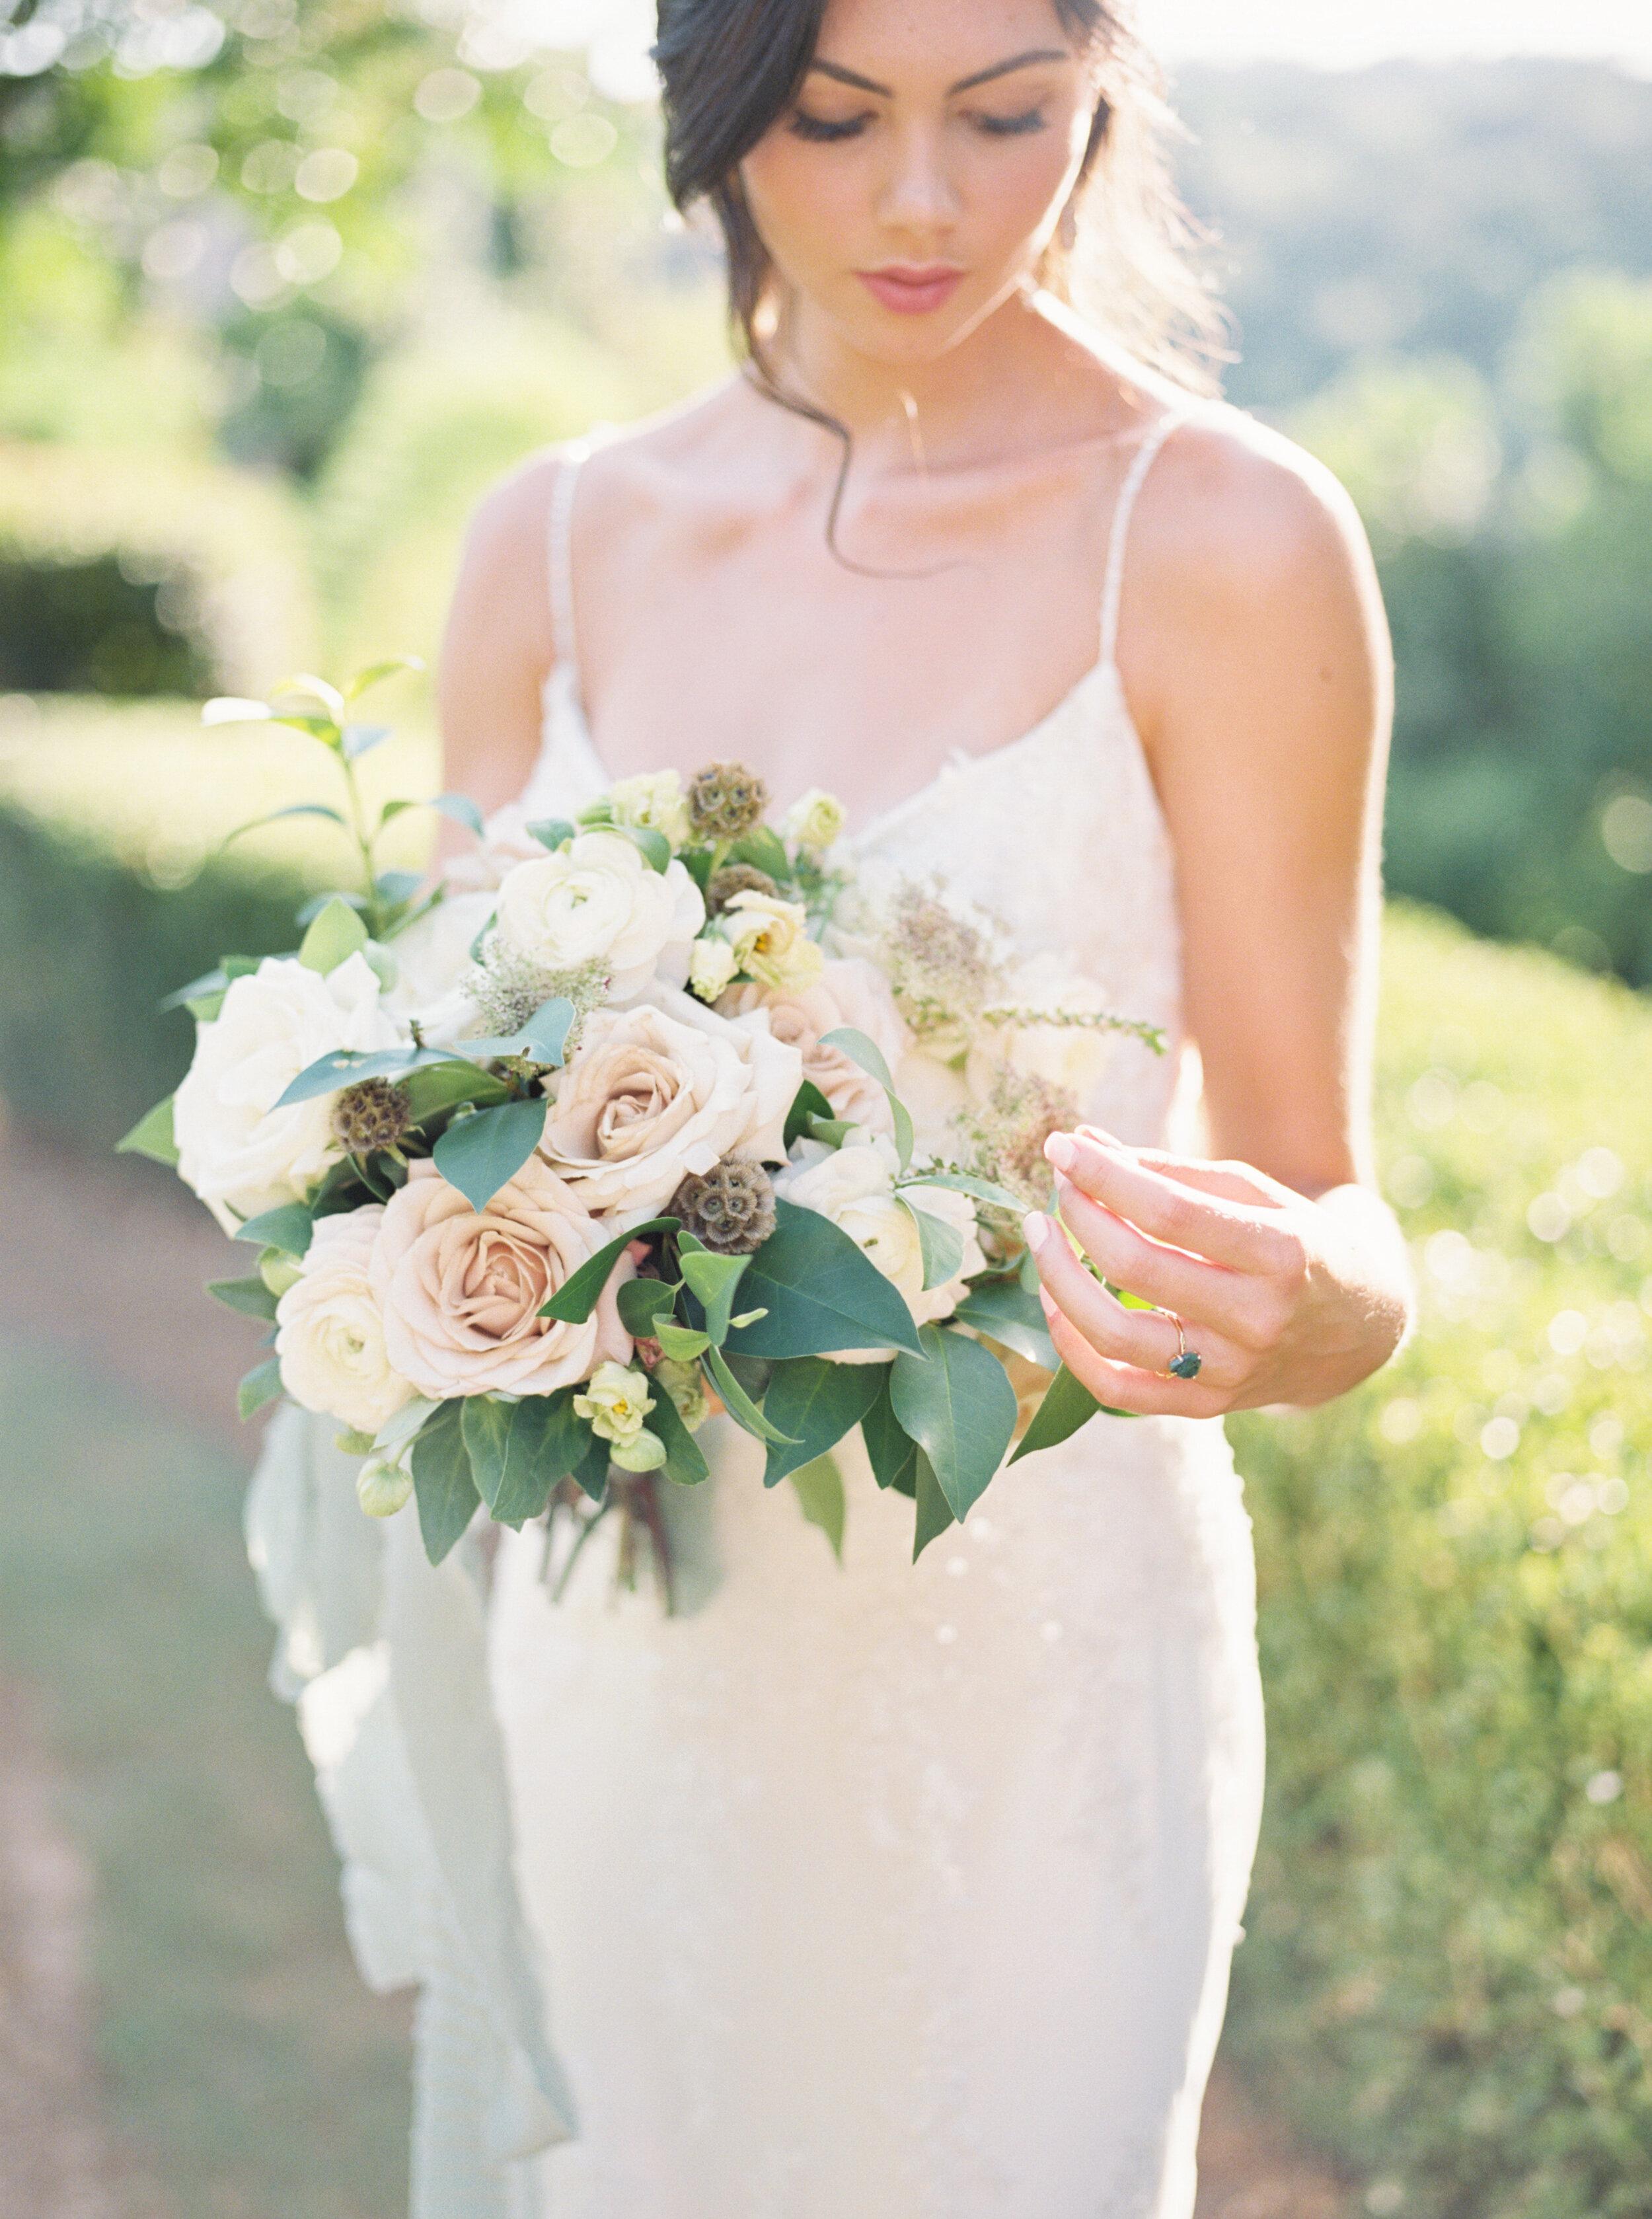 Bibb_Mill_Wedding_Editorial_Columbus_Georgia_Fallen_Photography_4-10.JPG